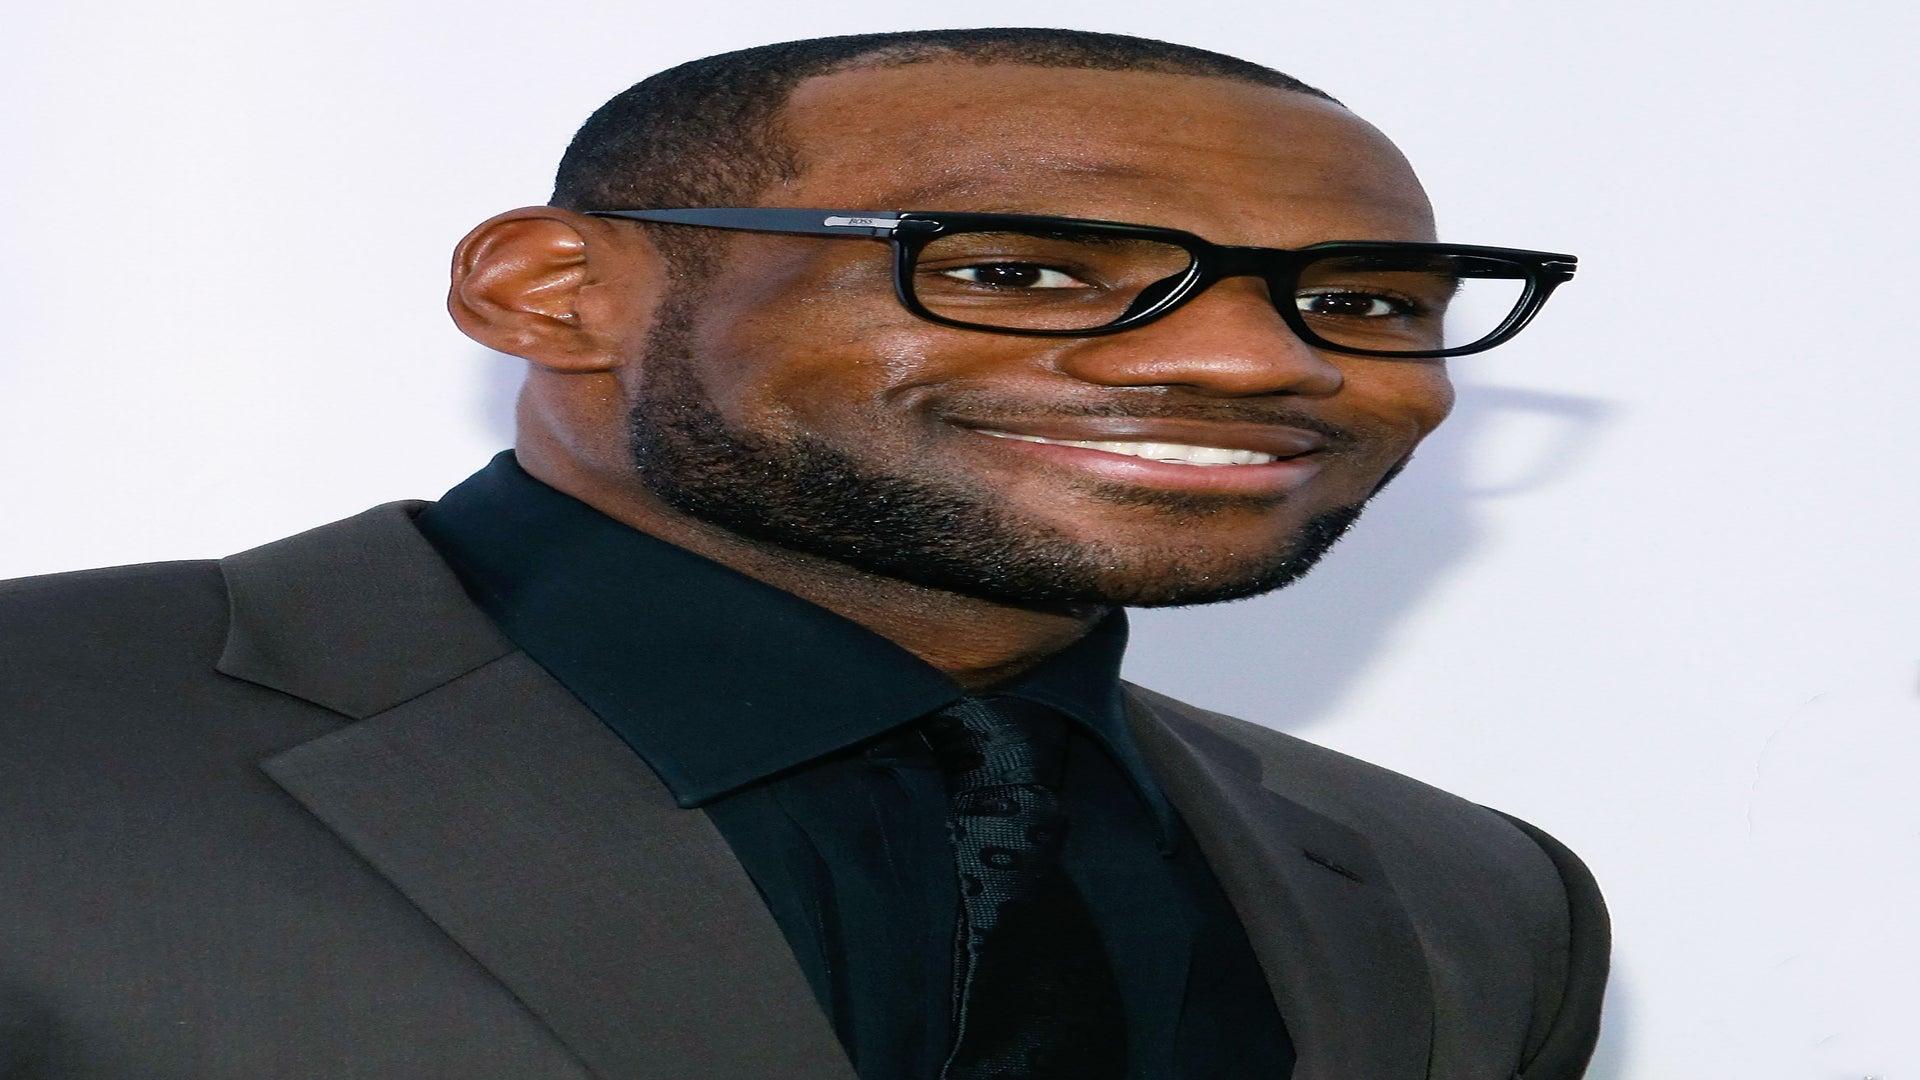 LeBron James producing Muhammad Ali documentary for HBO